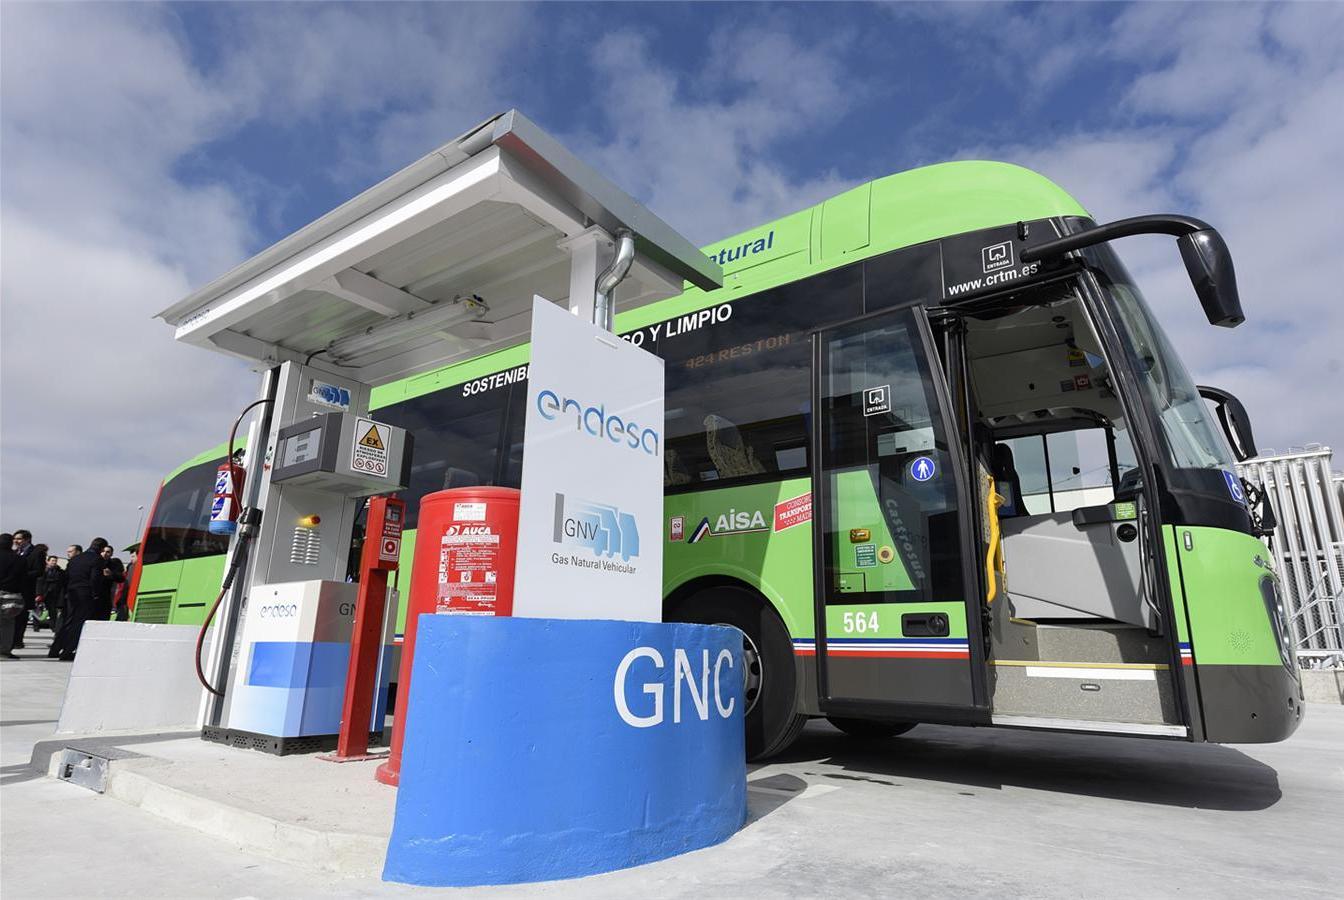 estacion-gnv-endesa-madrid